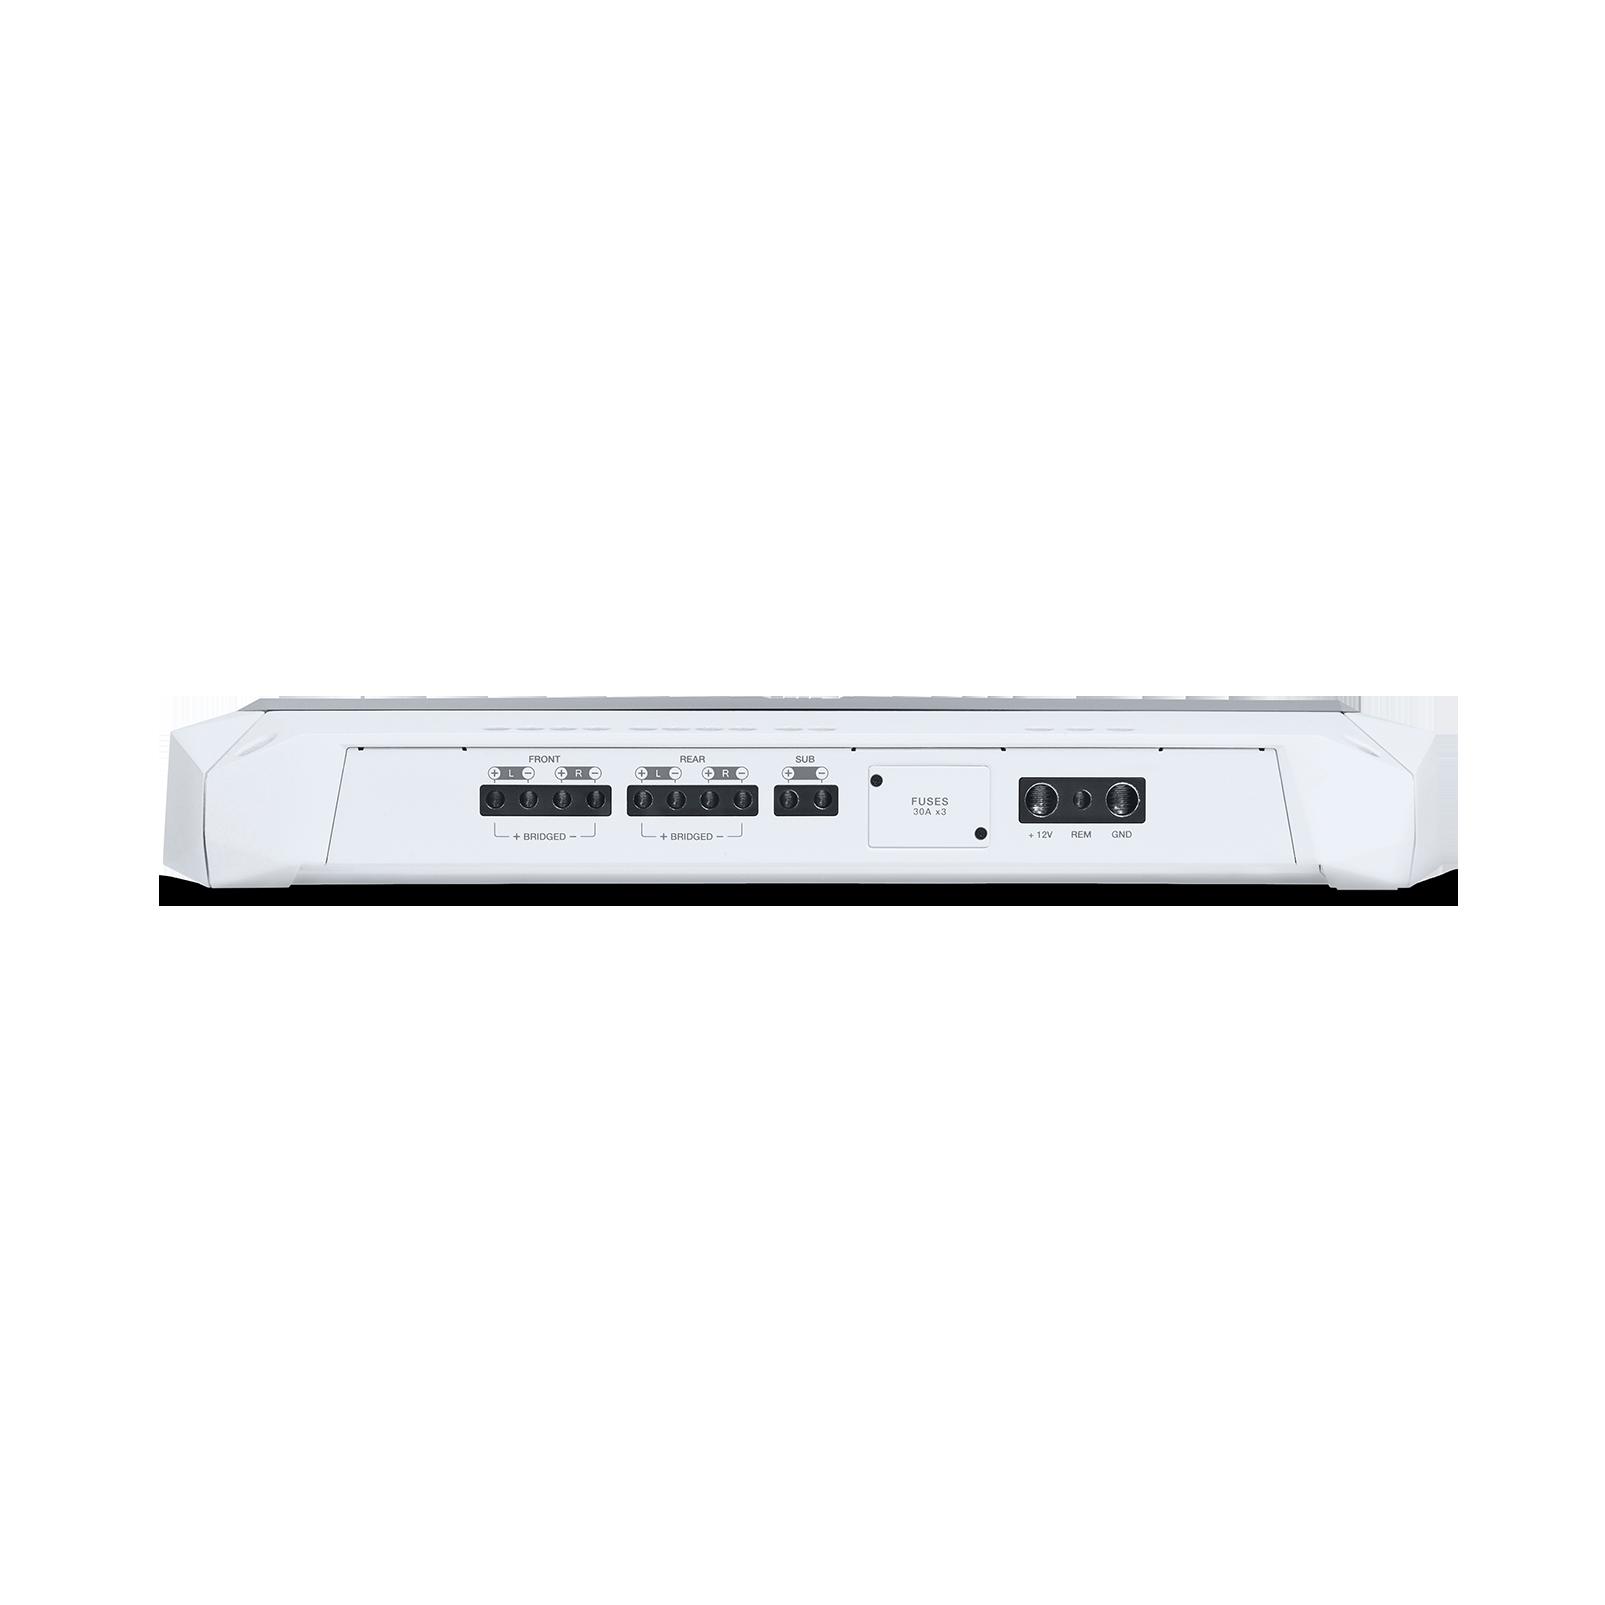 JBL Marine MA4505 - White Matte - Multi-element high-performance, 5-channel amplifier - Detailshot 1